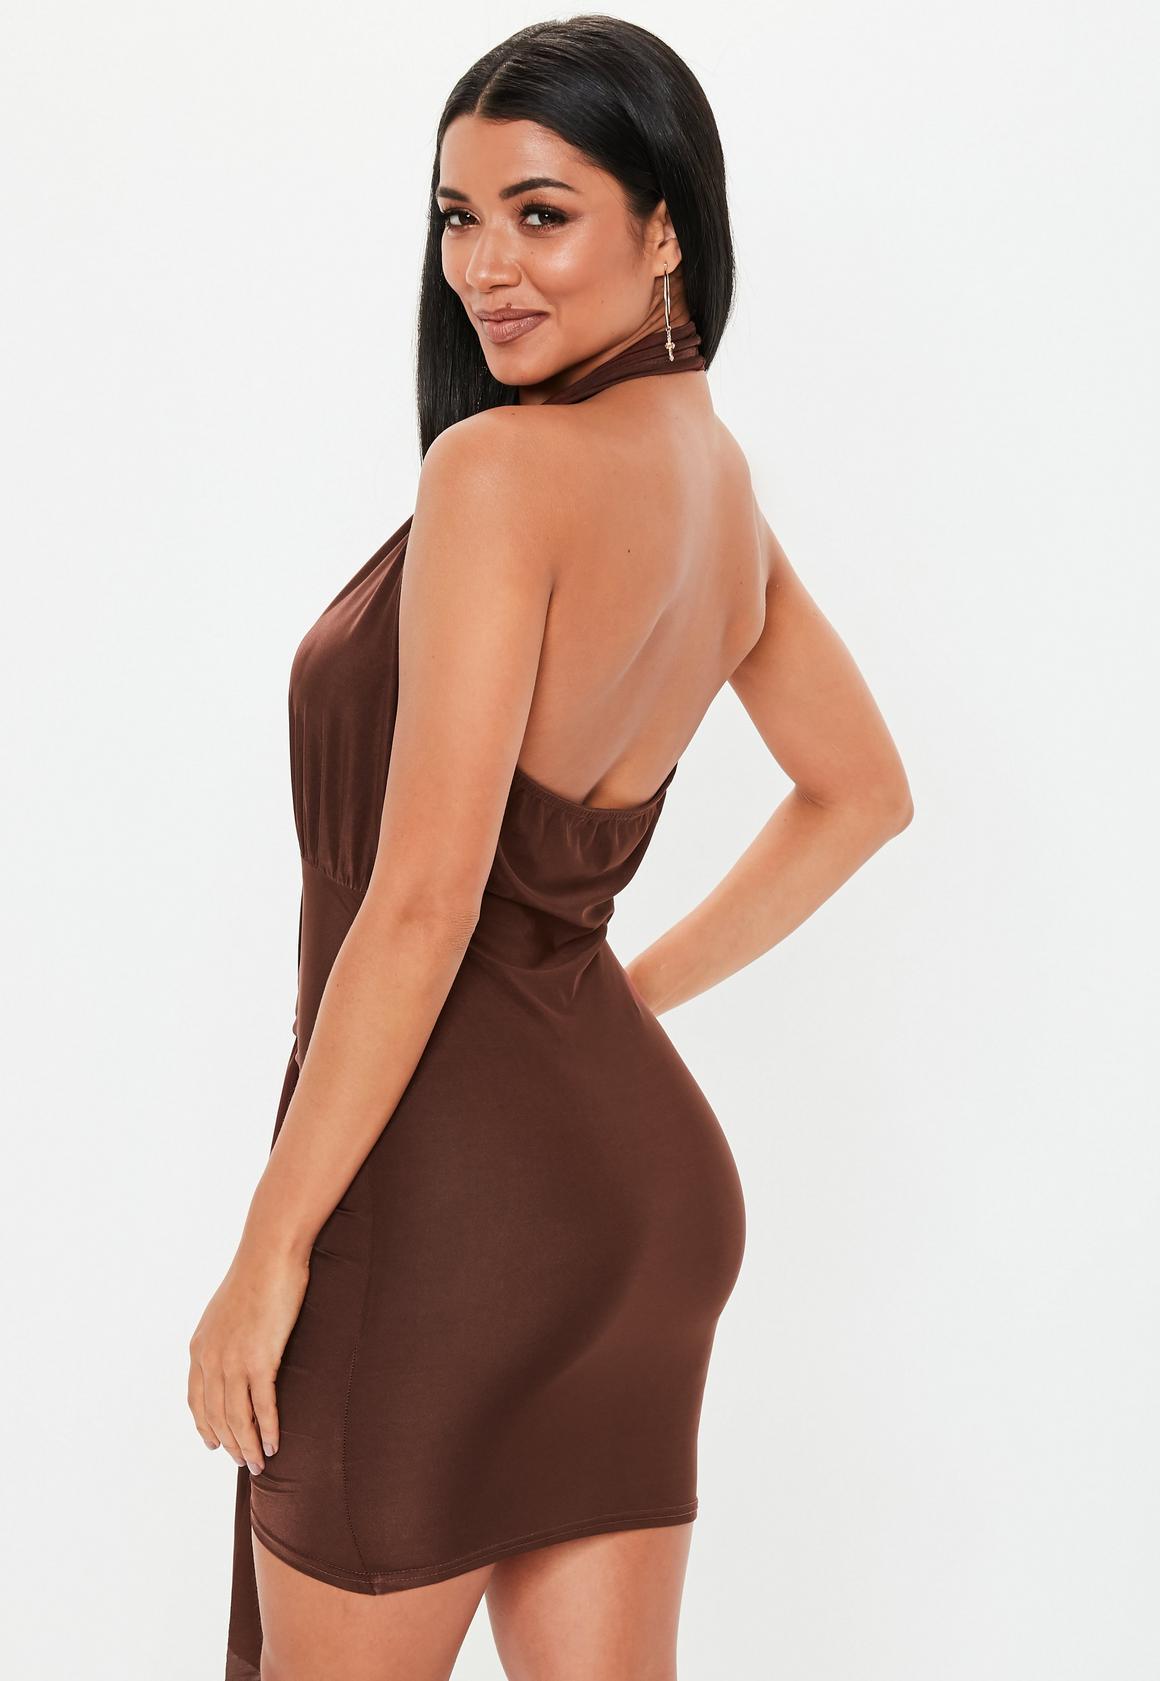 Missguided - robe dos-nu courte tissu drappé  - 4